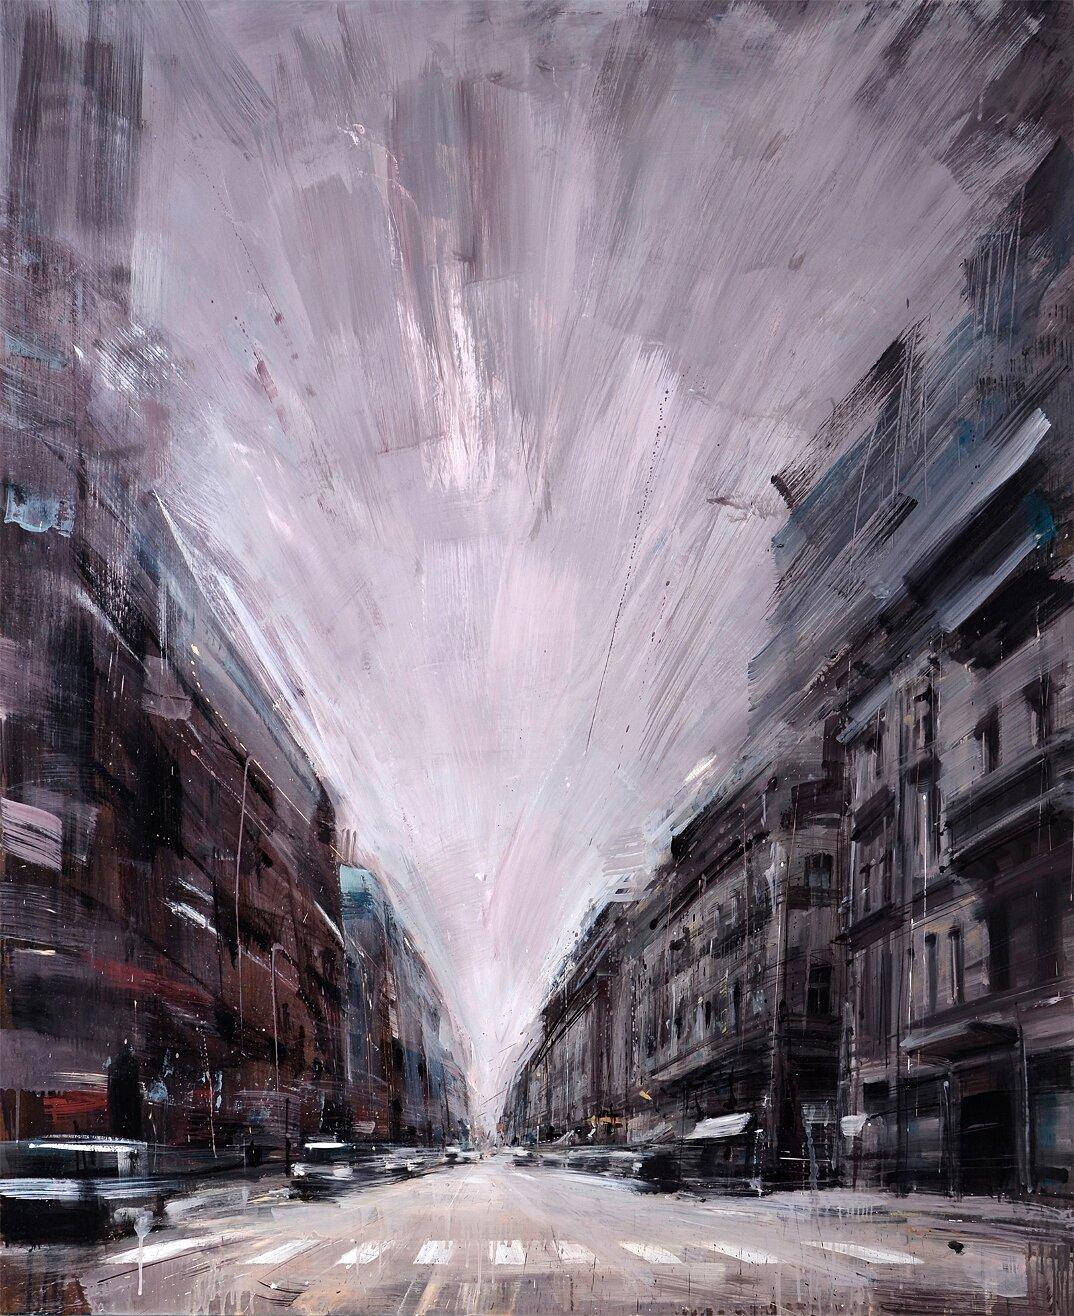 dipinti-citta-new-york-milano-parigi-movimento-valerio-dospina-13